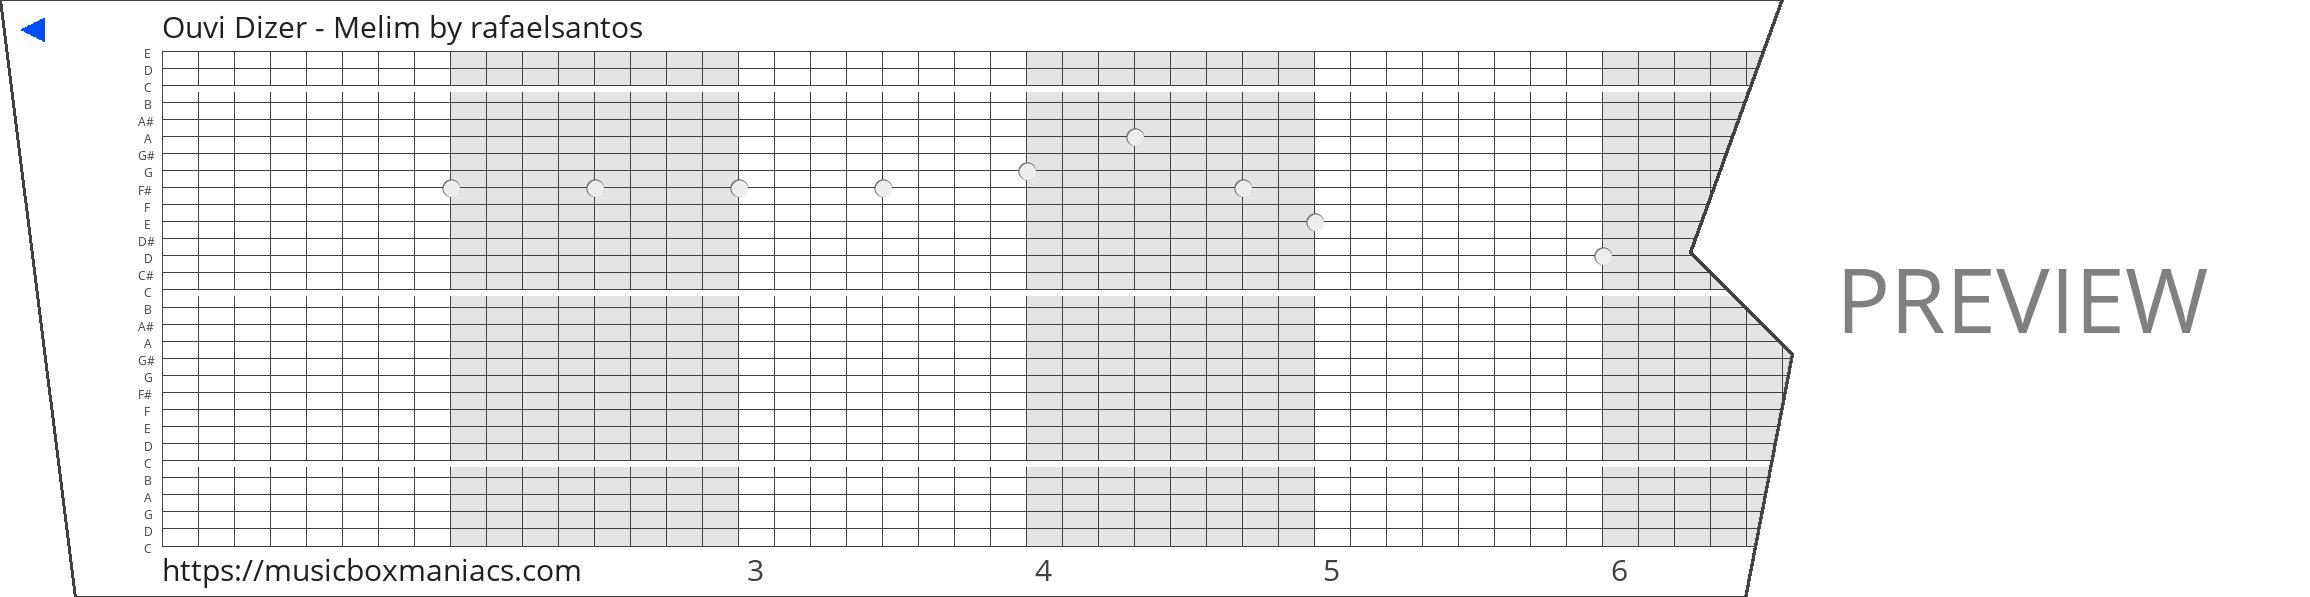 Ouvi Dizer - Melim 30 note music box paper strip